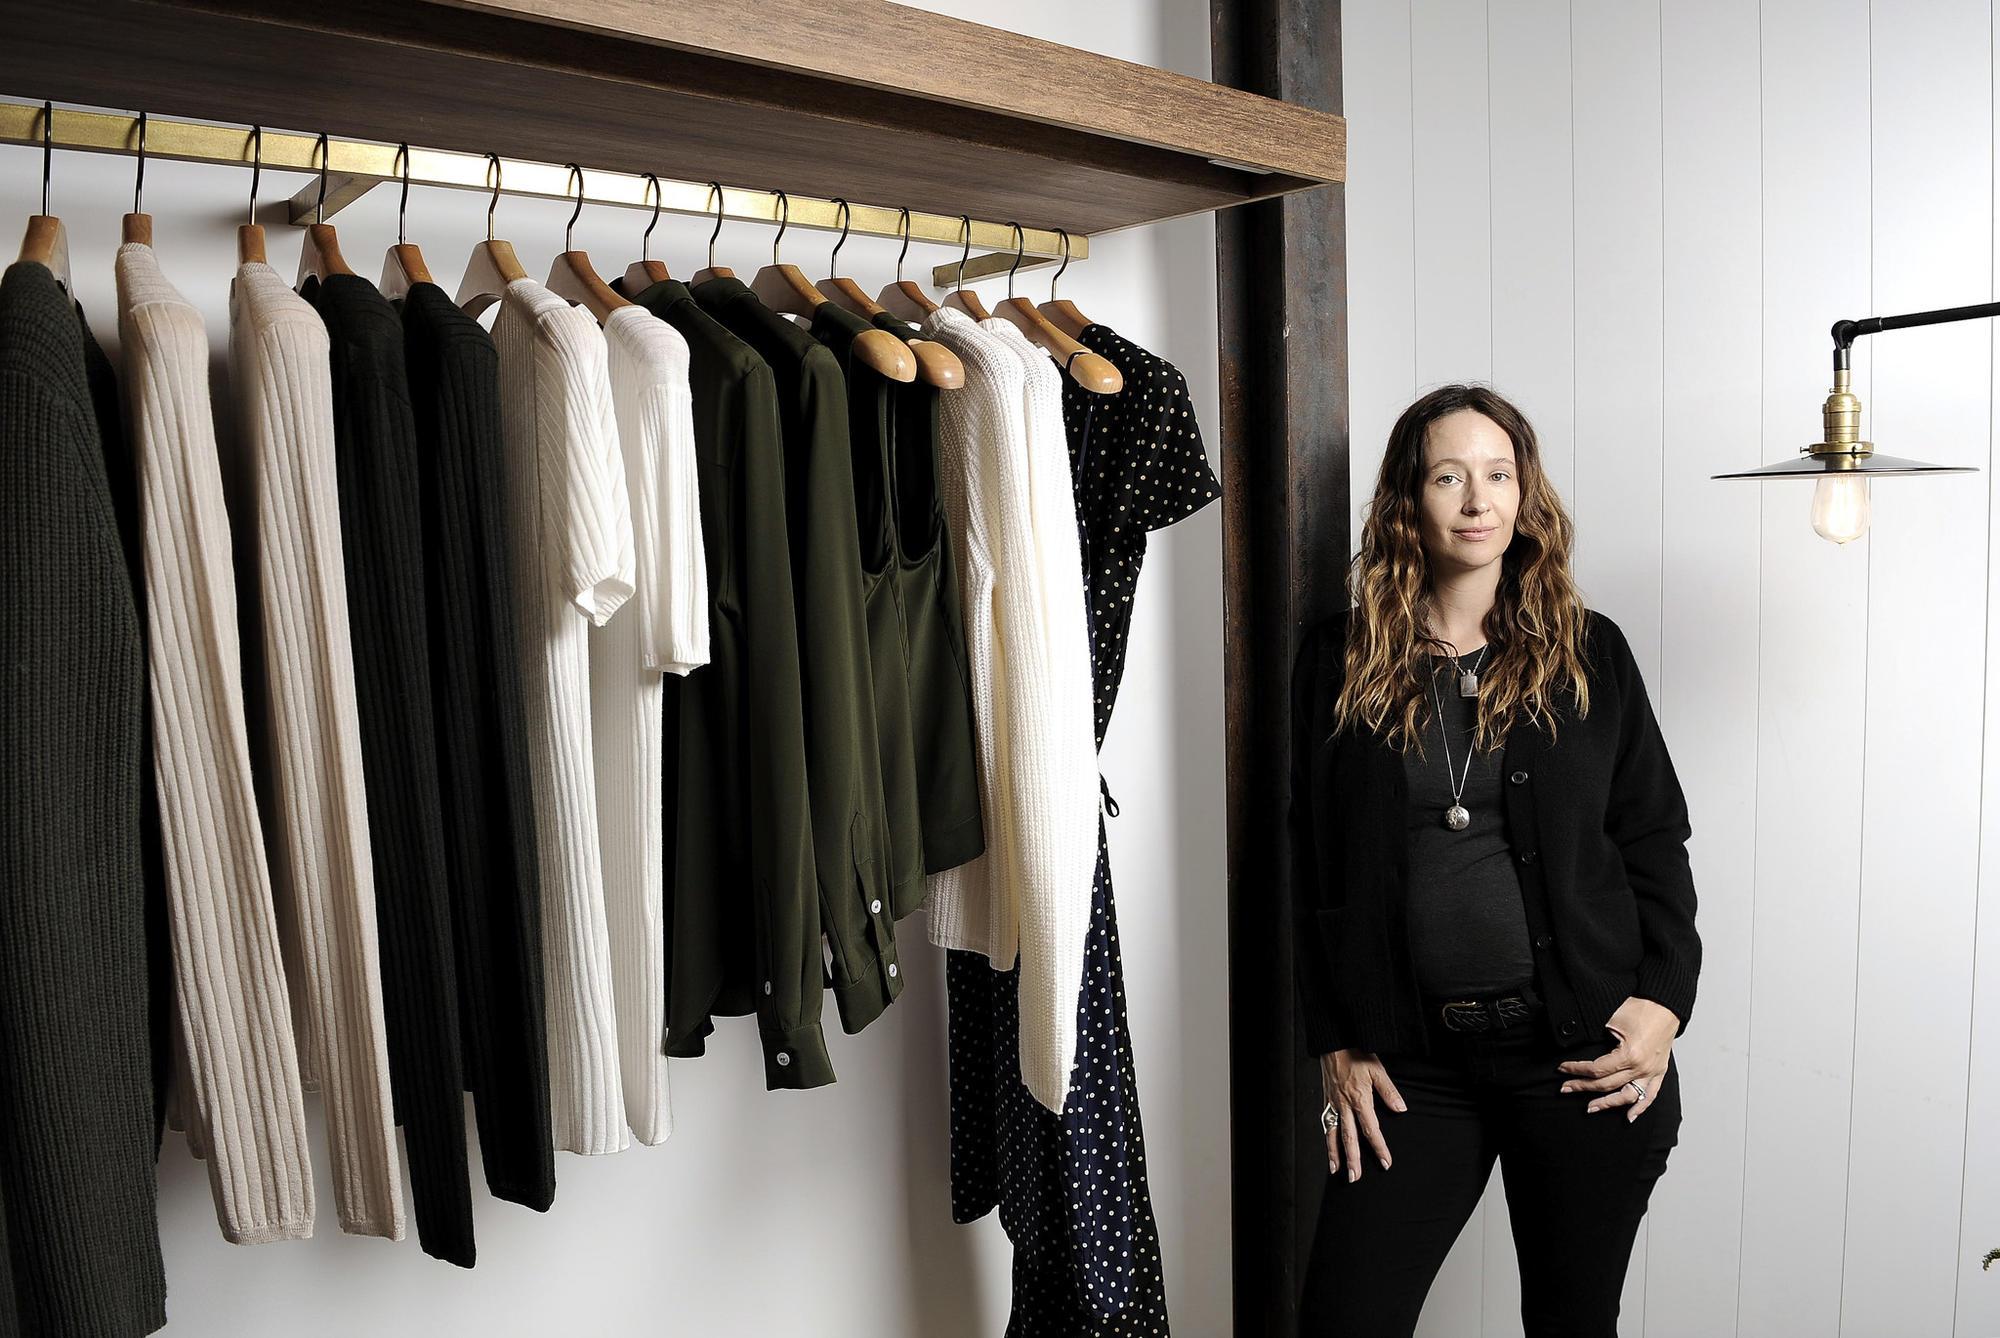 Designer Jenni Kayne at her Brentwood store.